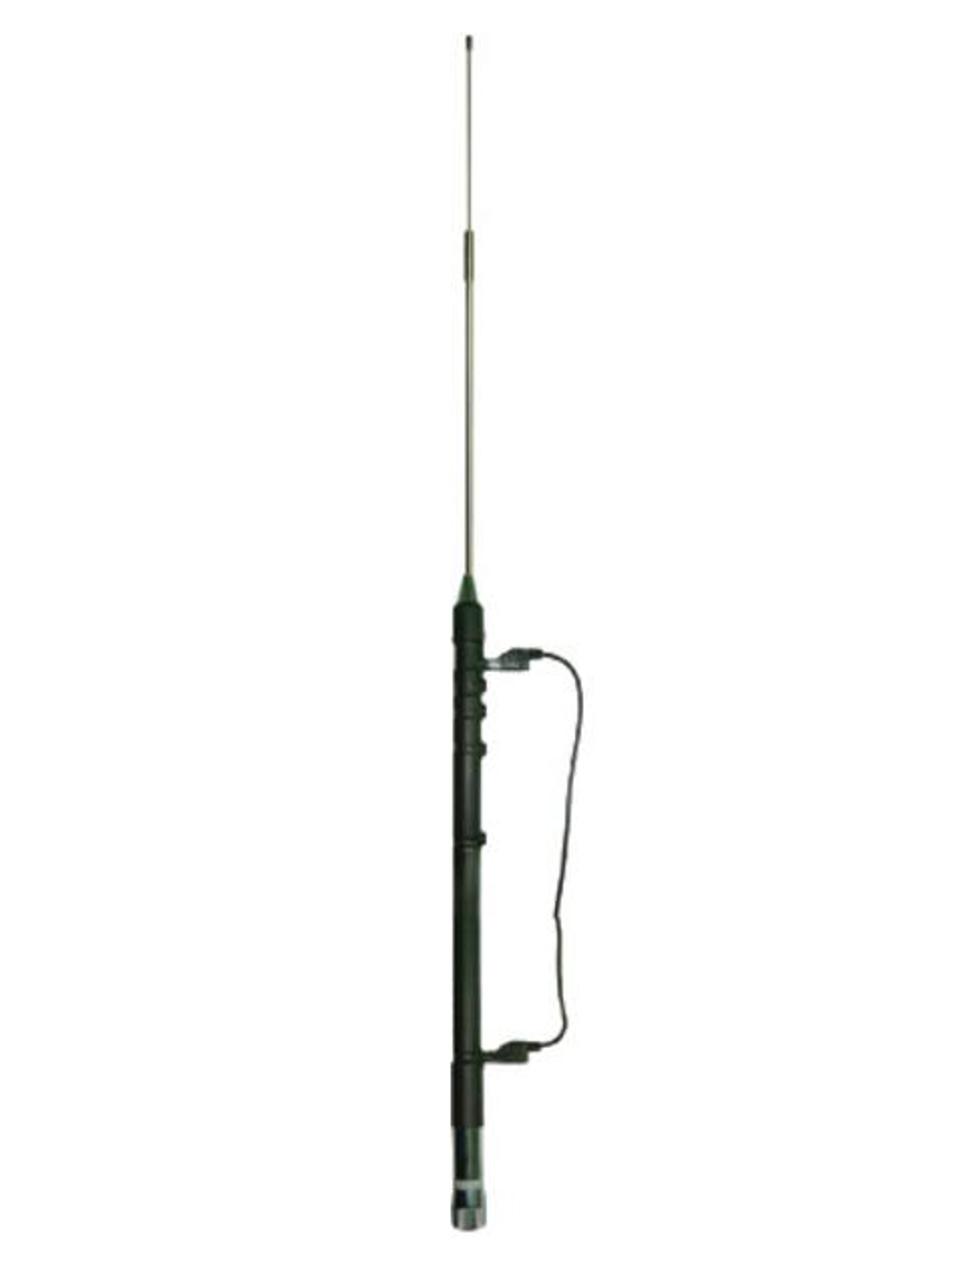 OPEK HVT-400B - 8 Band High Performance HF VHF UHF Ham